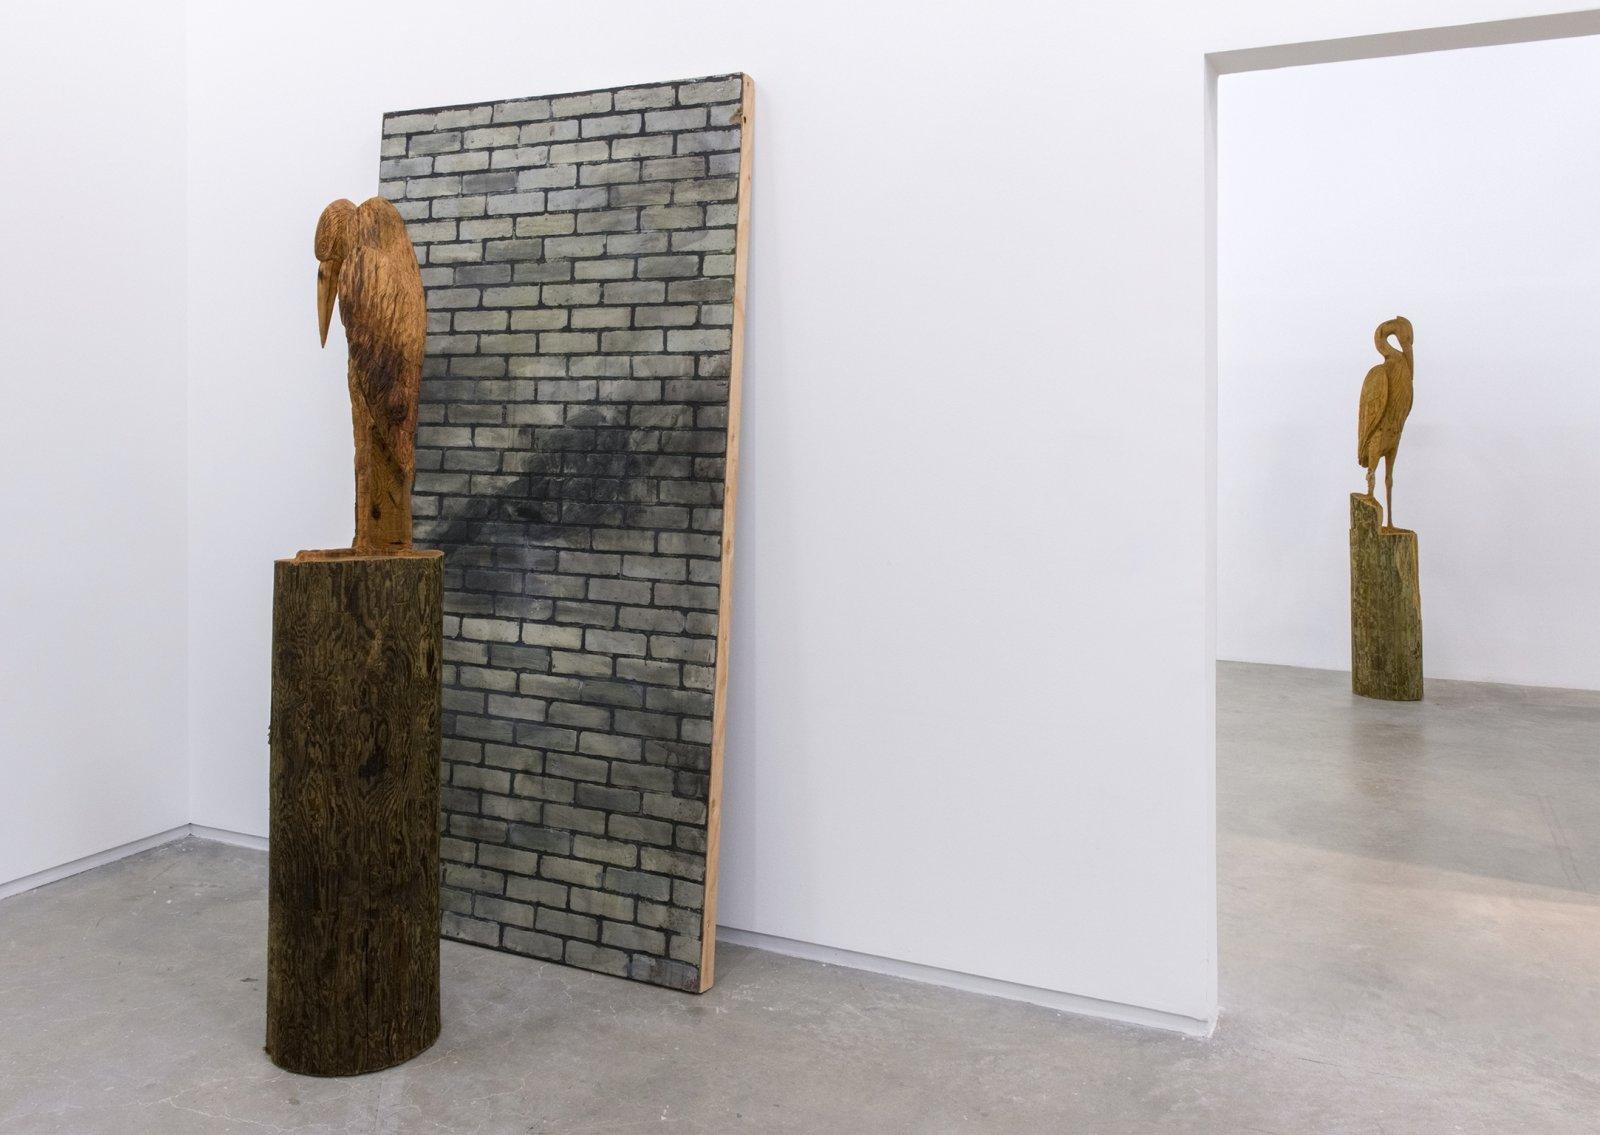 Geoffrey Farmer, Good And Evil, 2014, decommissioned cedar telephone poles, chainsaw carving by Brigitte Lochhead, wooden wall brick façade, Good: 77 x 15 x 14 in. (196 x 38 x 36 cm), Evil: 82 x 14 x 13 in. (208 x 36 x 33 cm) by Geoffrey Farmer